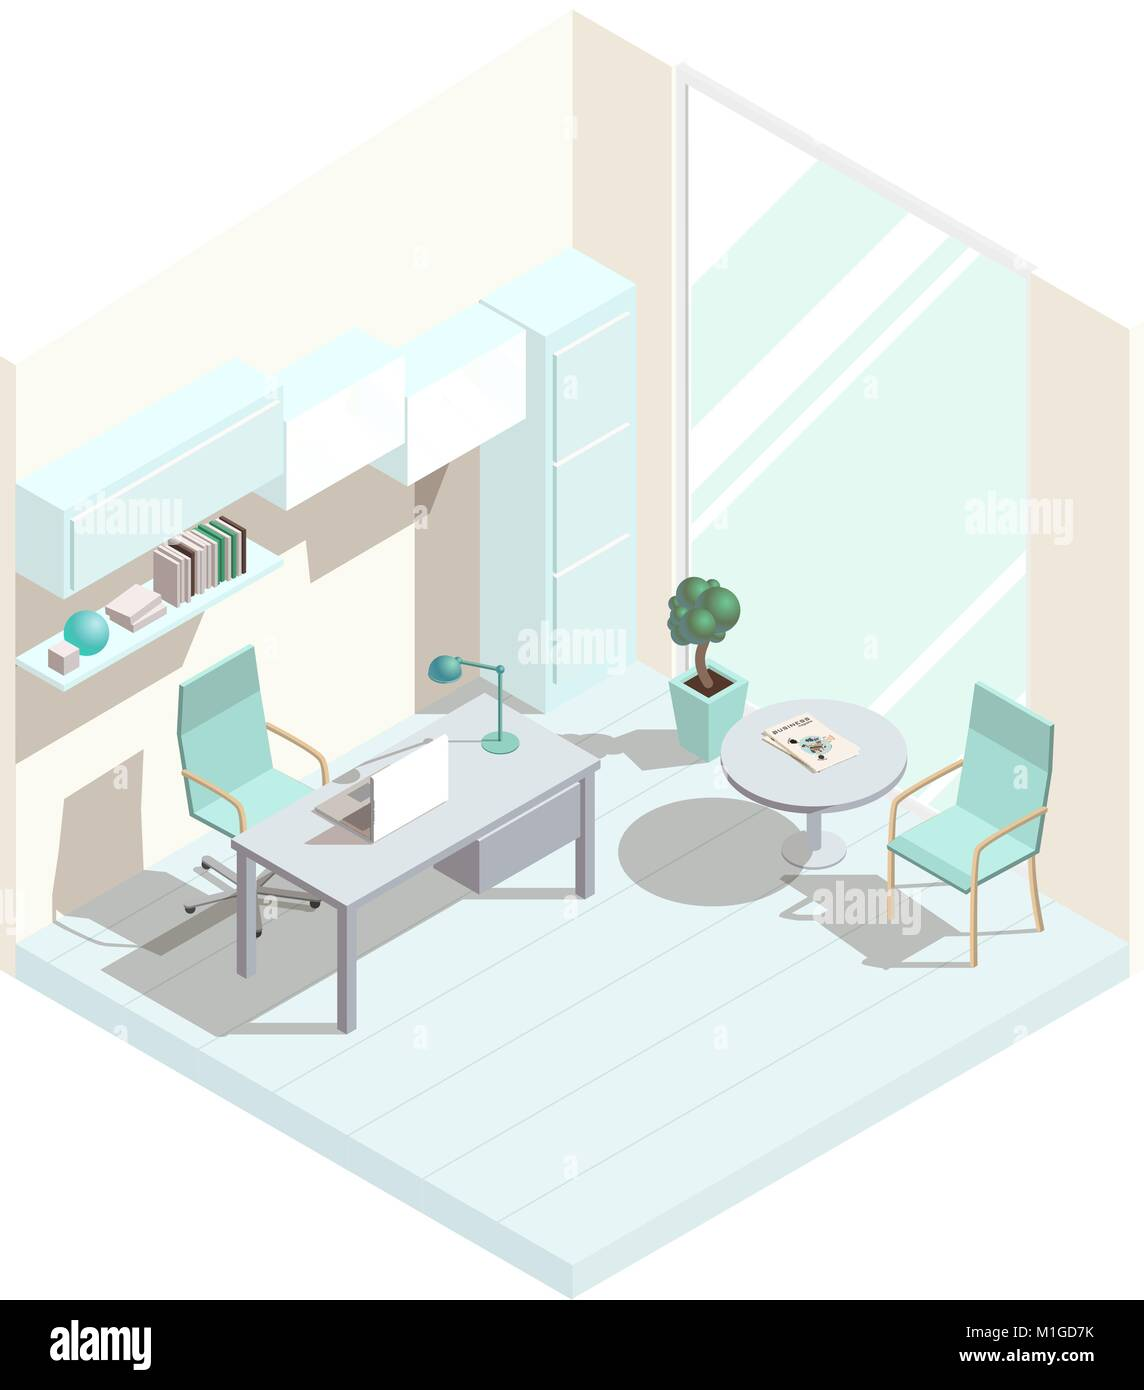 Isometric office interior - Stock Image